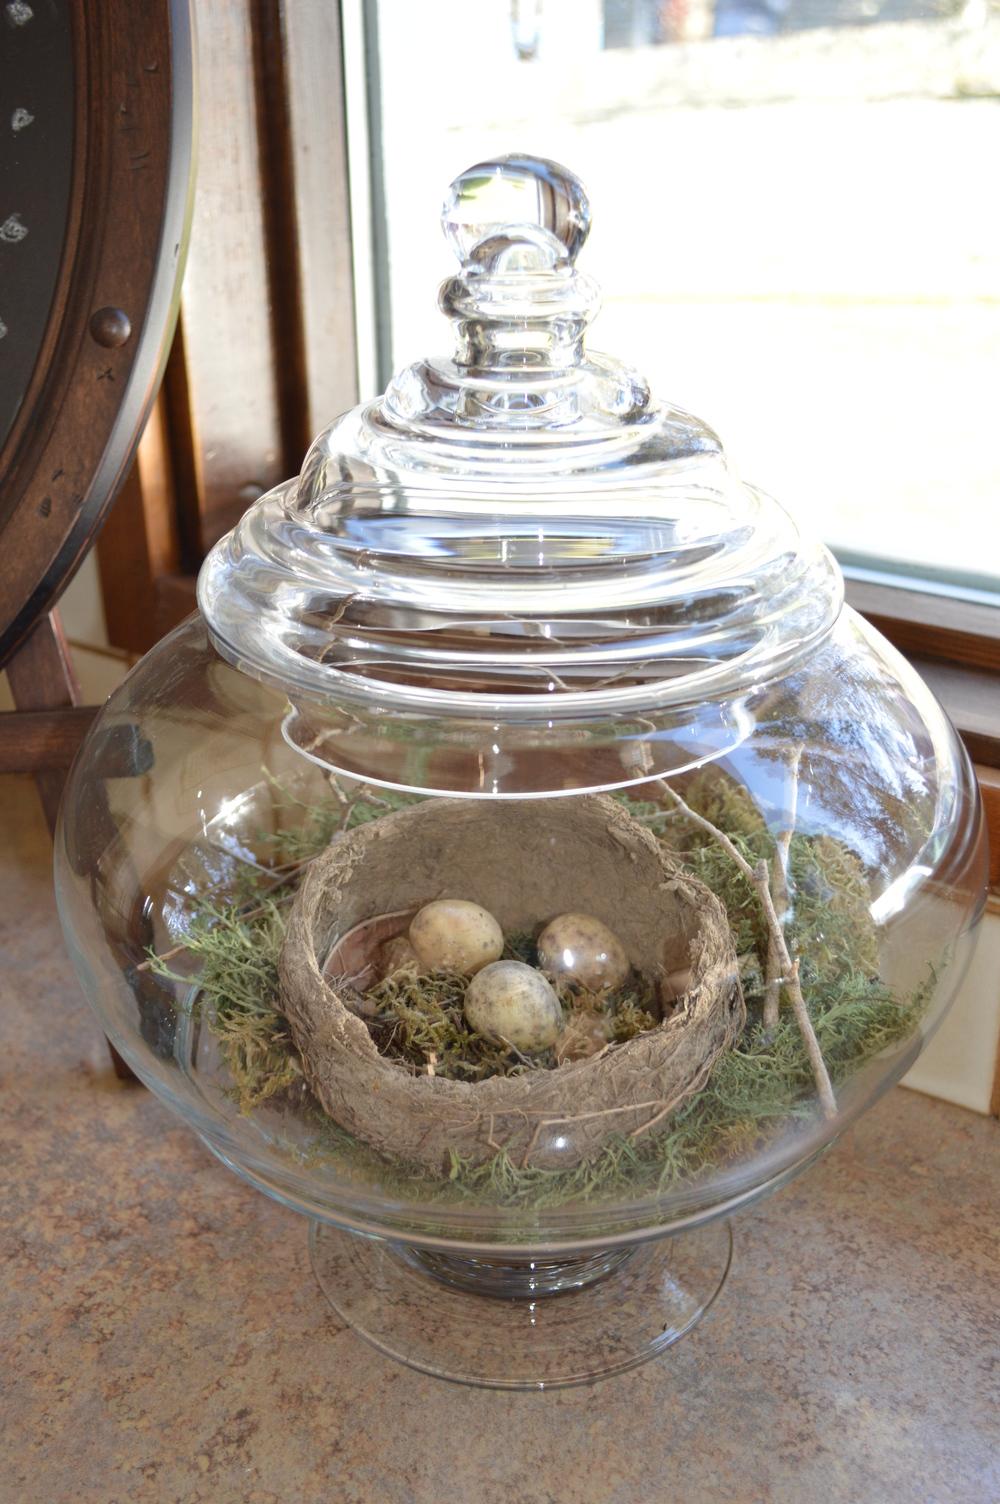 A found abandoned bird's nest...